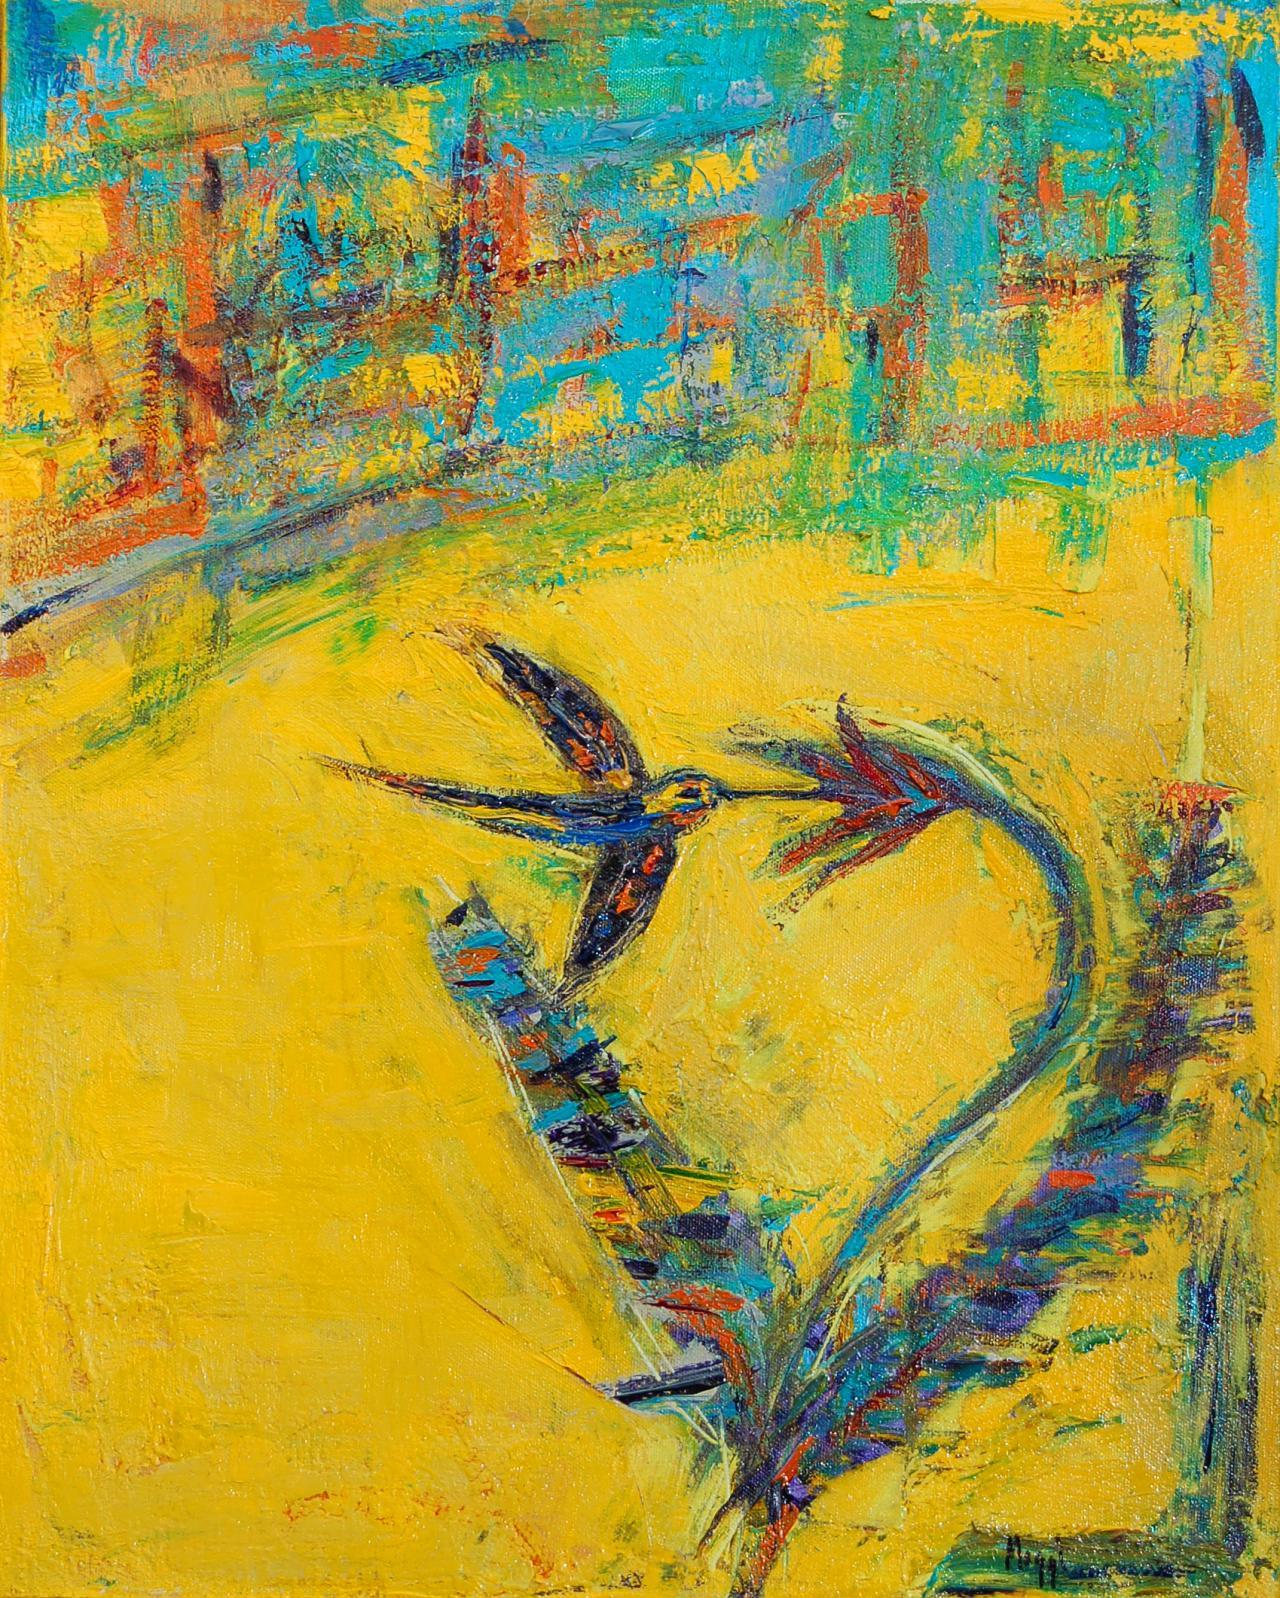 Hummingbird_Bensen.267222910_large.jpg